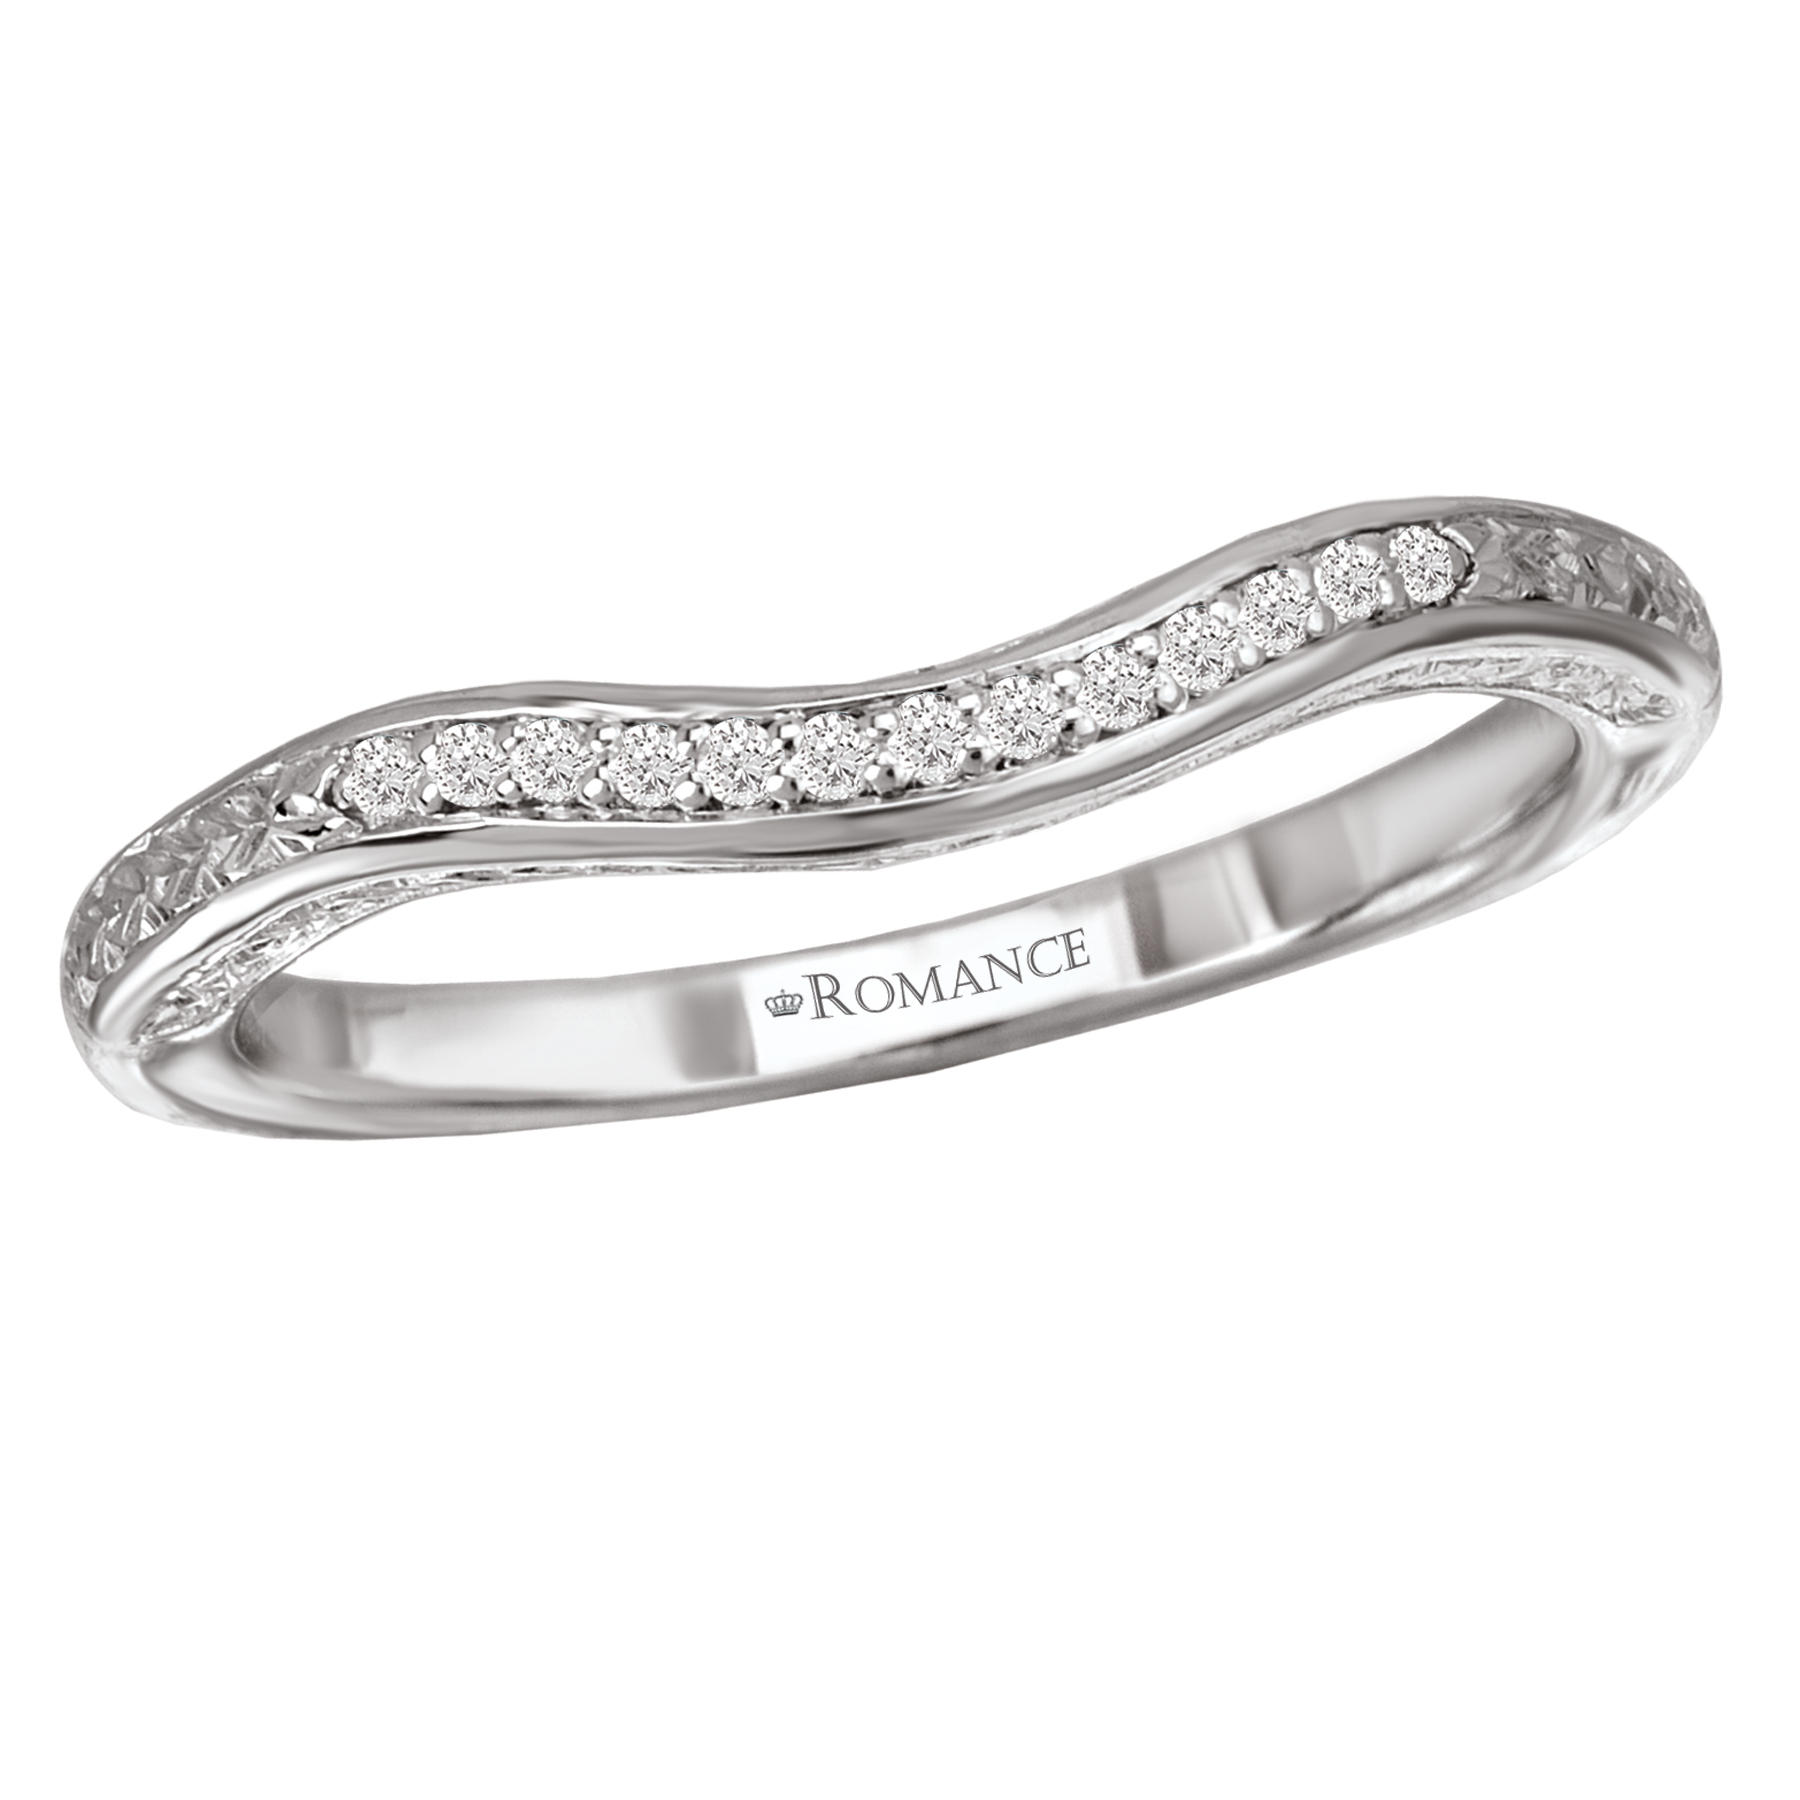 Romance Wedding Bands 117584-100W product image